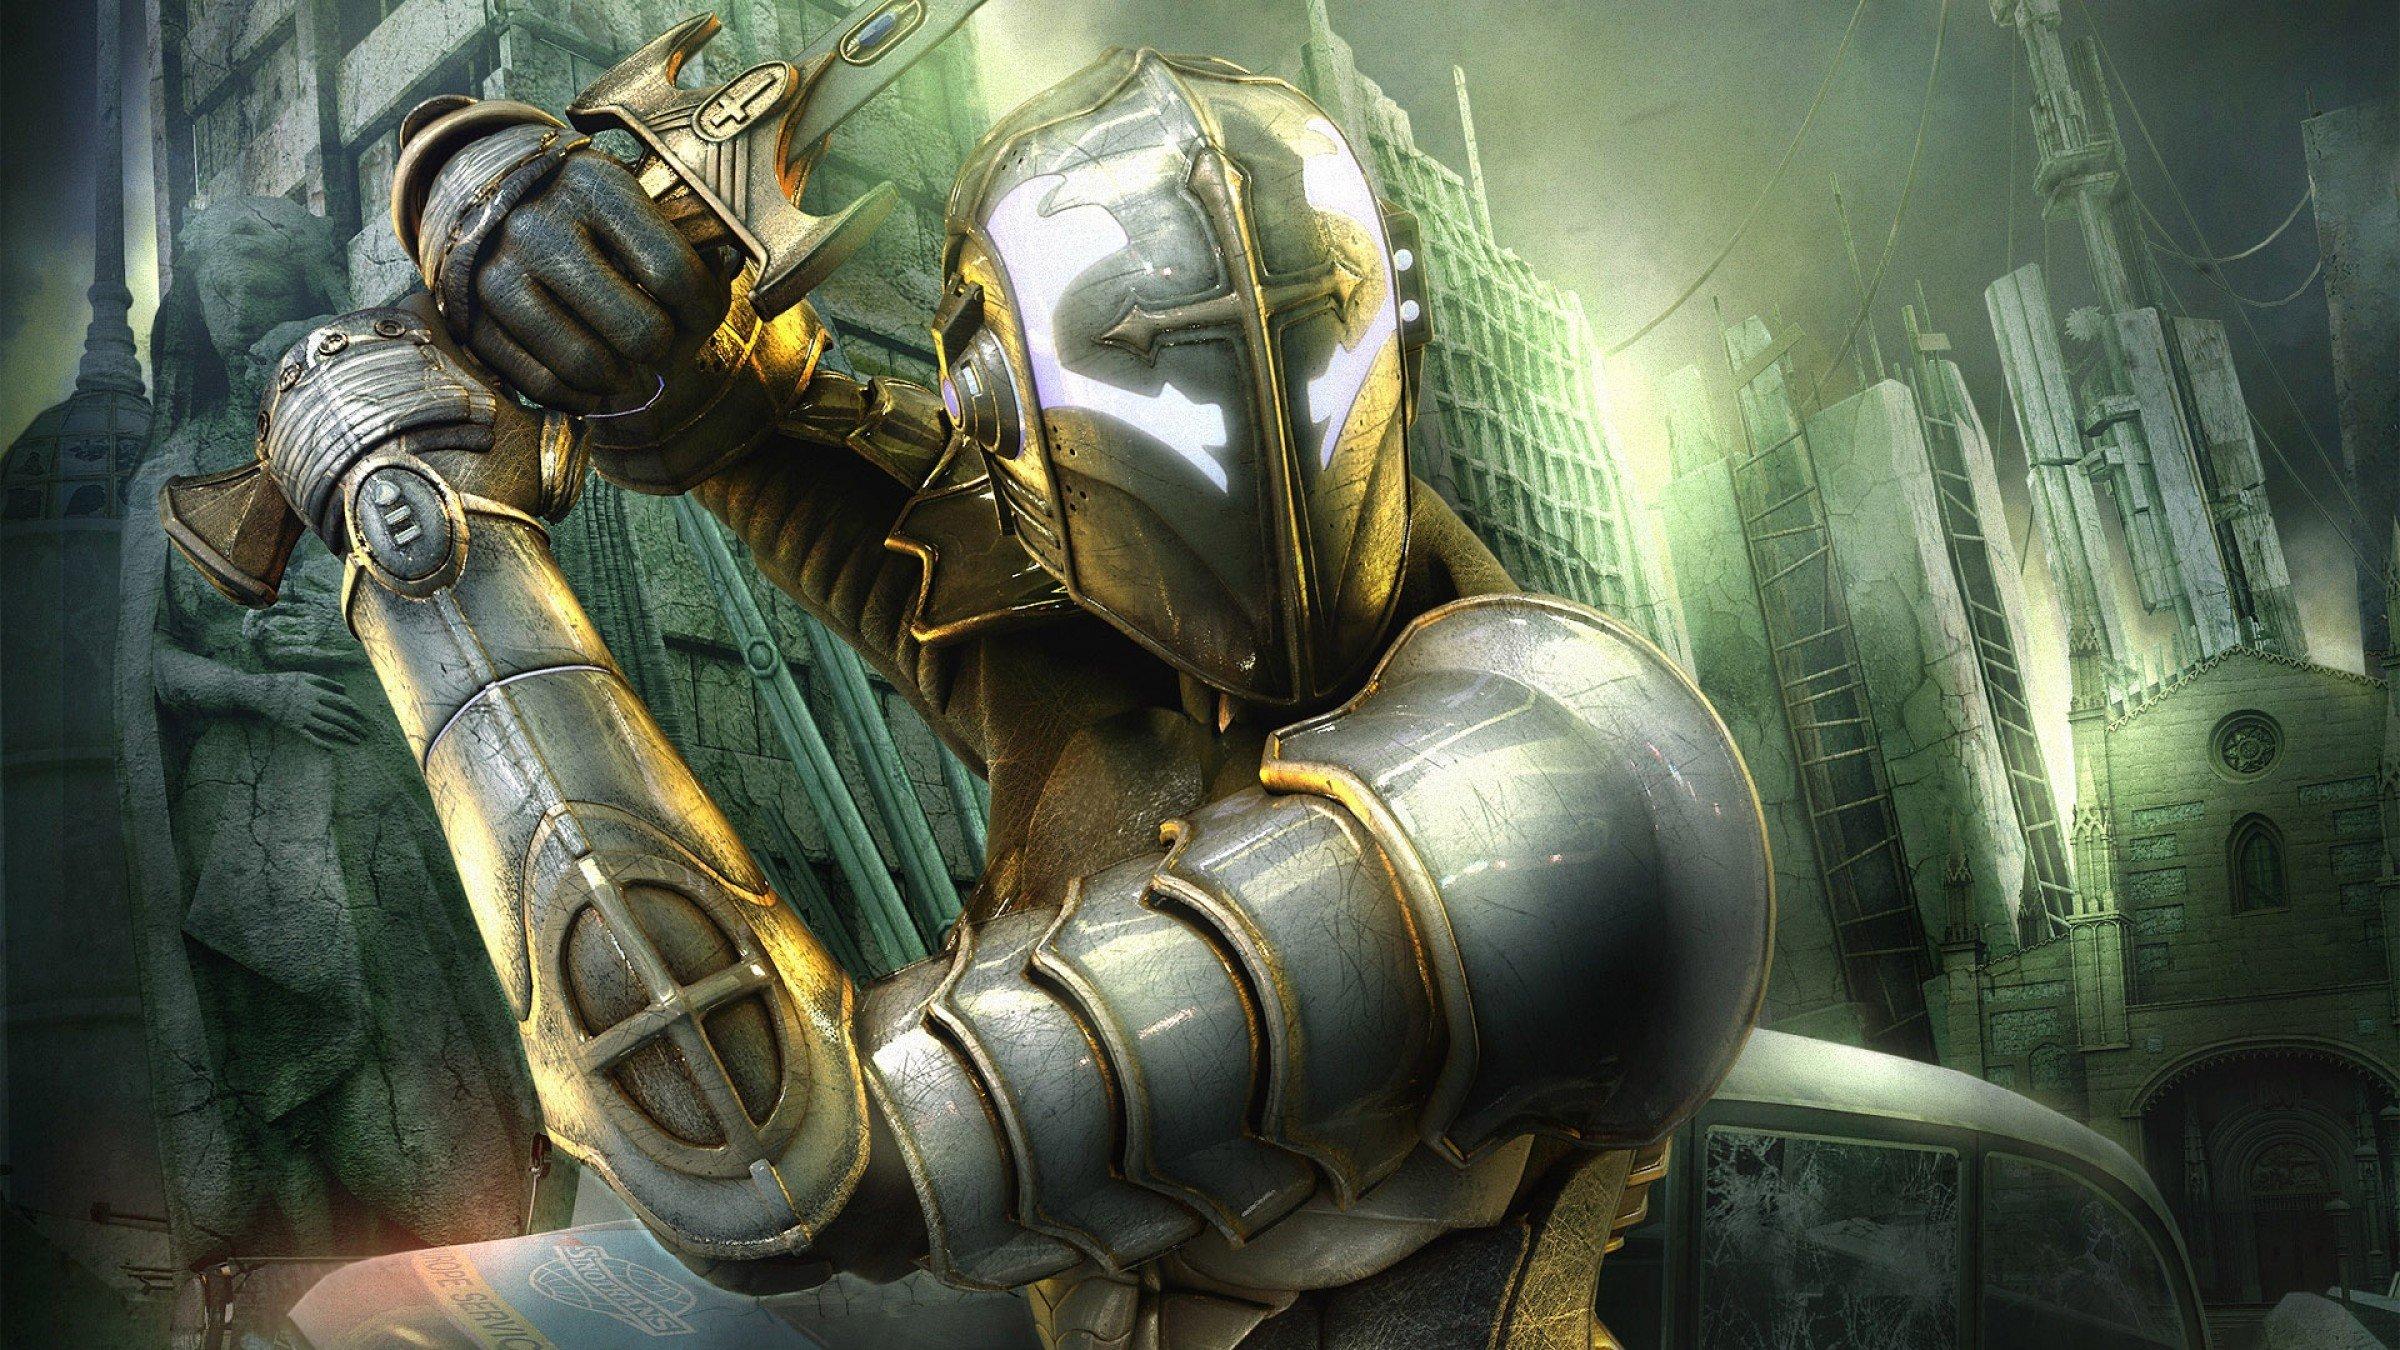 LONDON fantasy action sci fi warrior knight armor wallpaper background 2400x1350